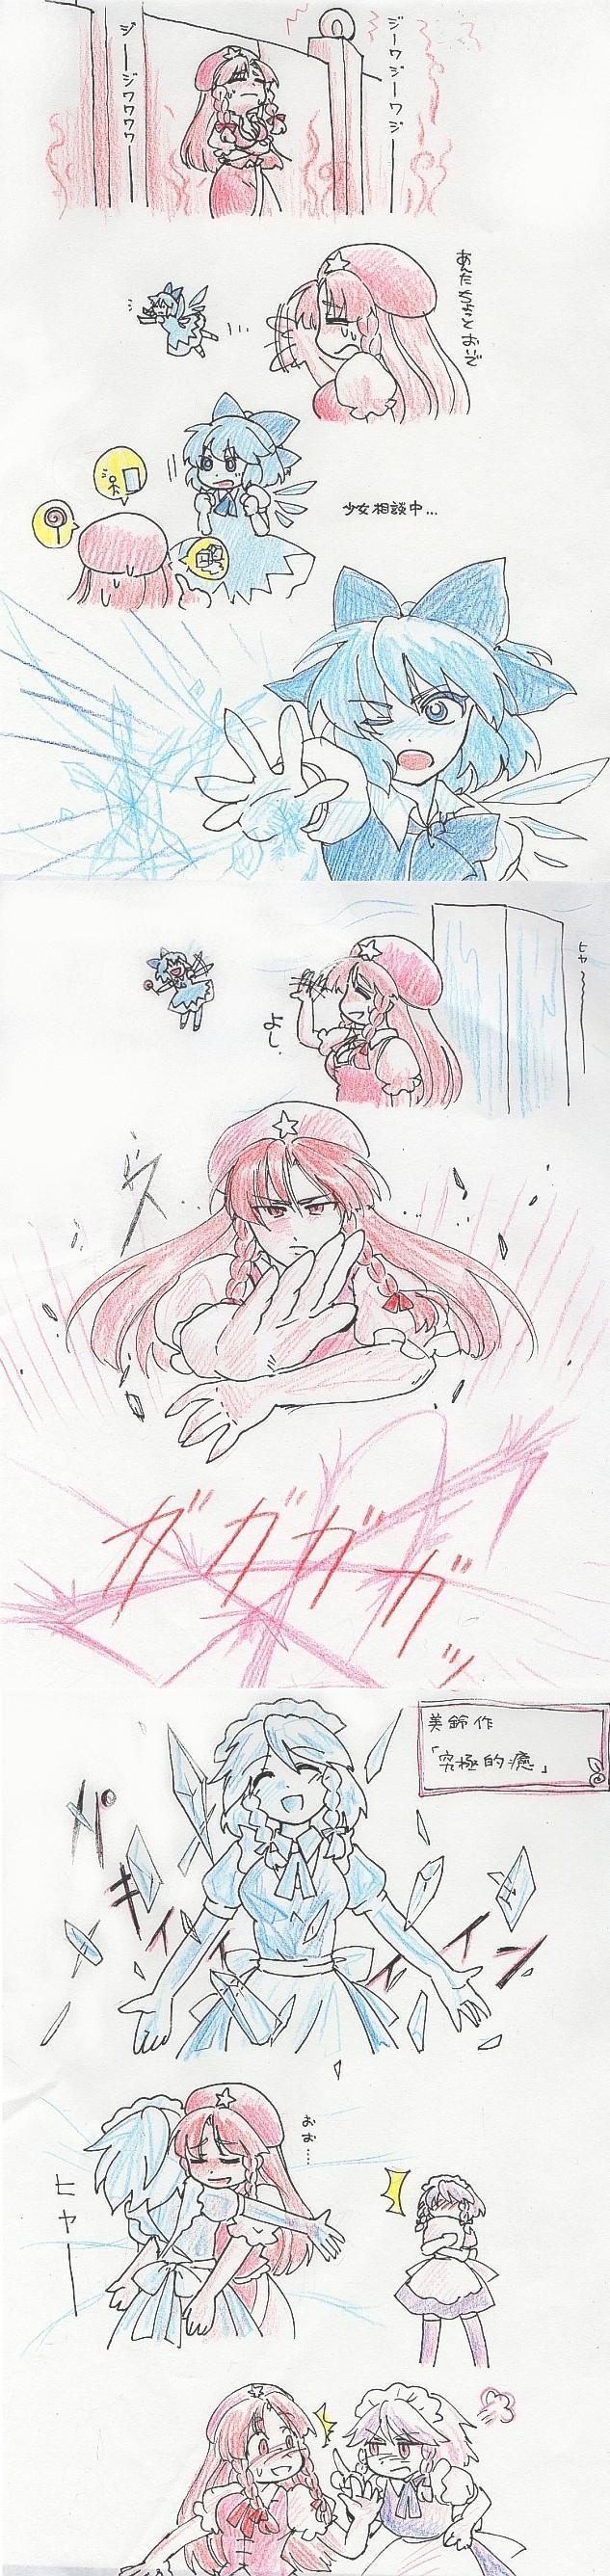 cirno, hong meiling, and izayoi sakuya (touhou) drawn by mokkouyou bondo